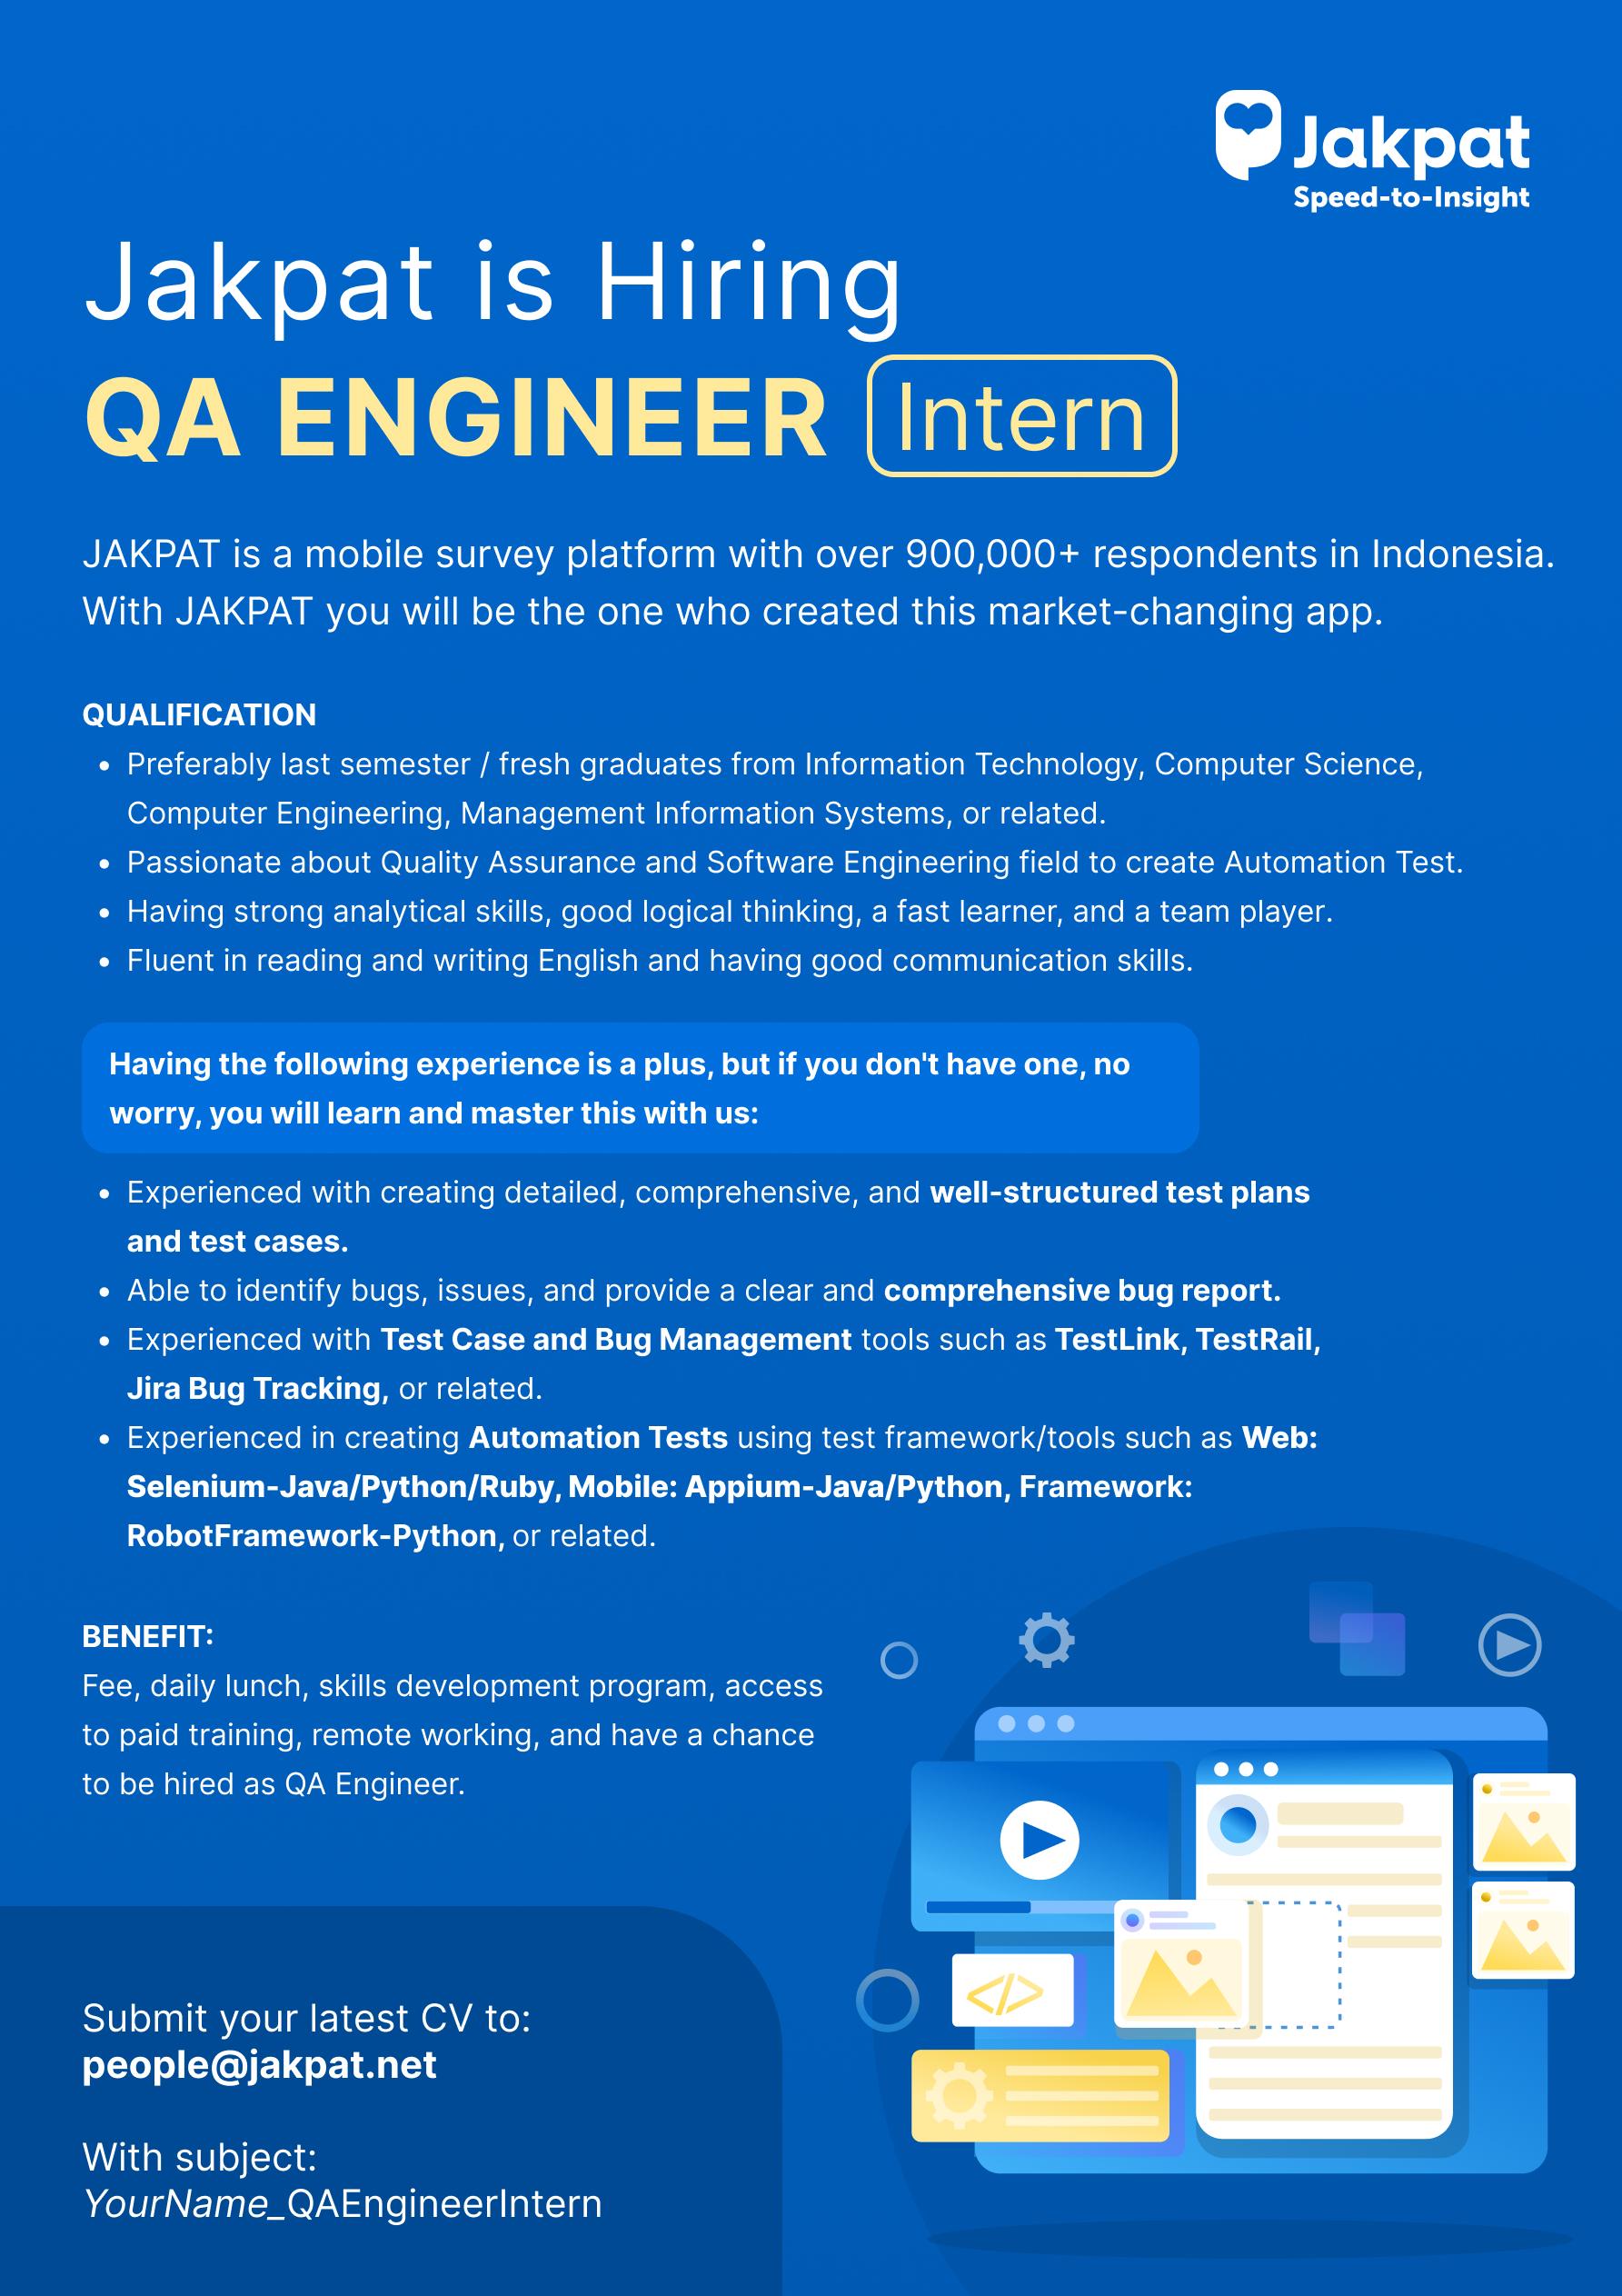 jakpat-is-hiring-qa-engineer-intern